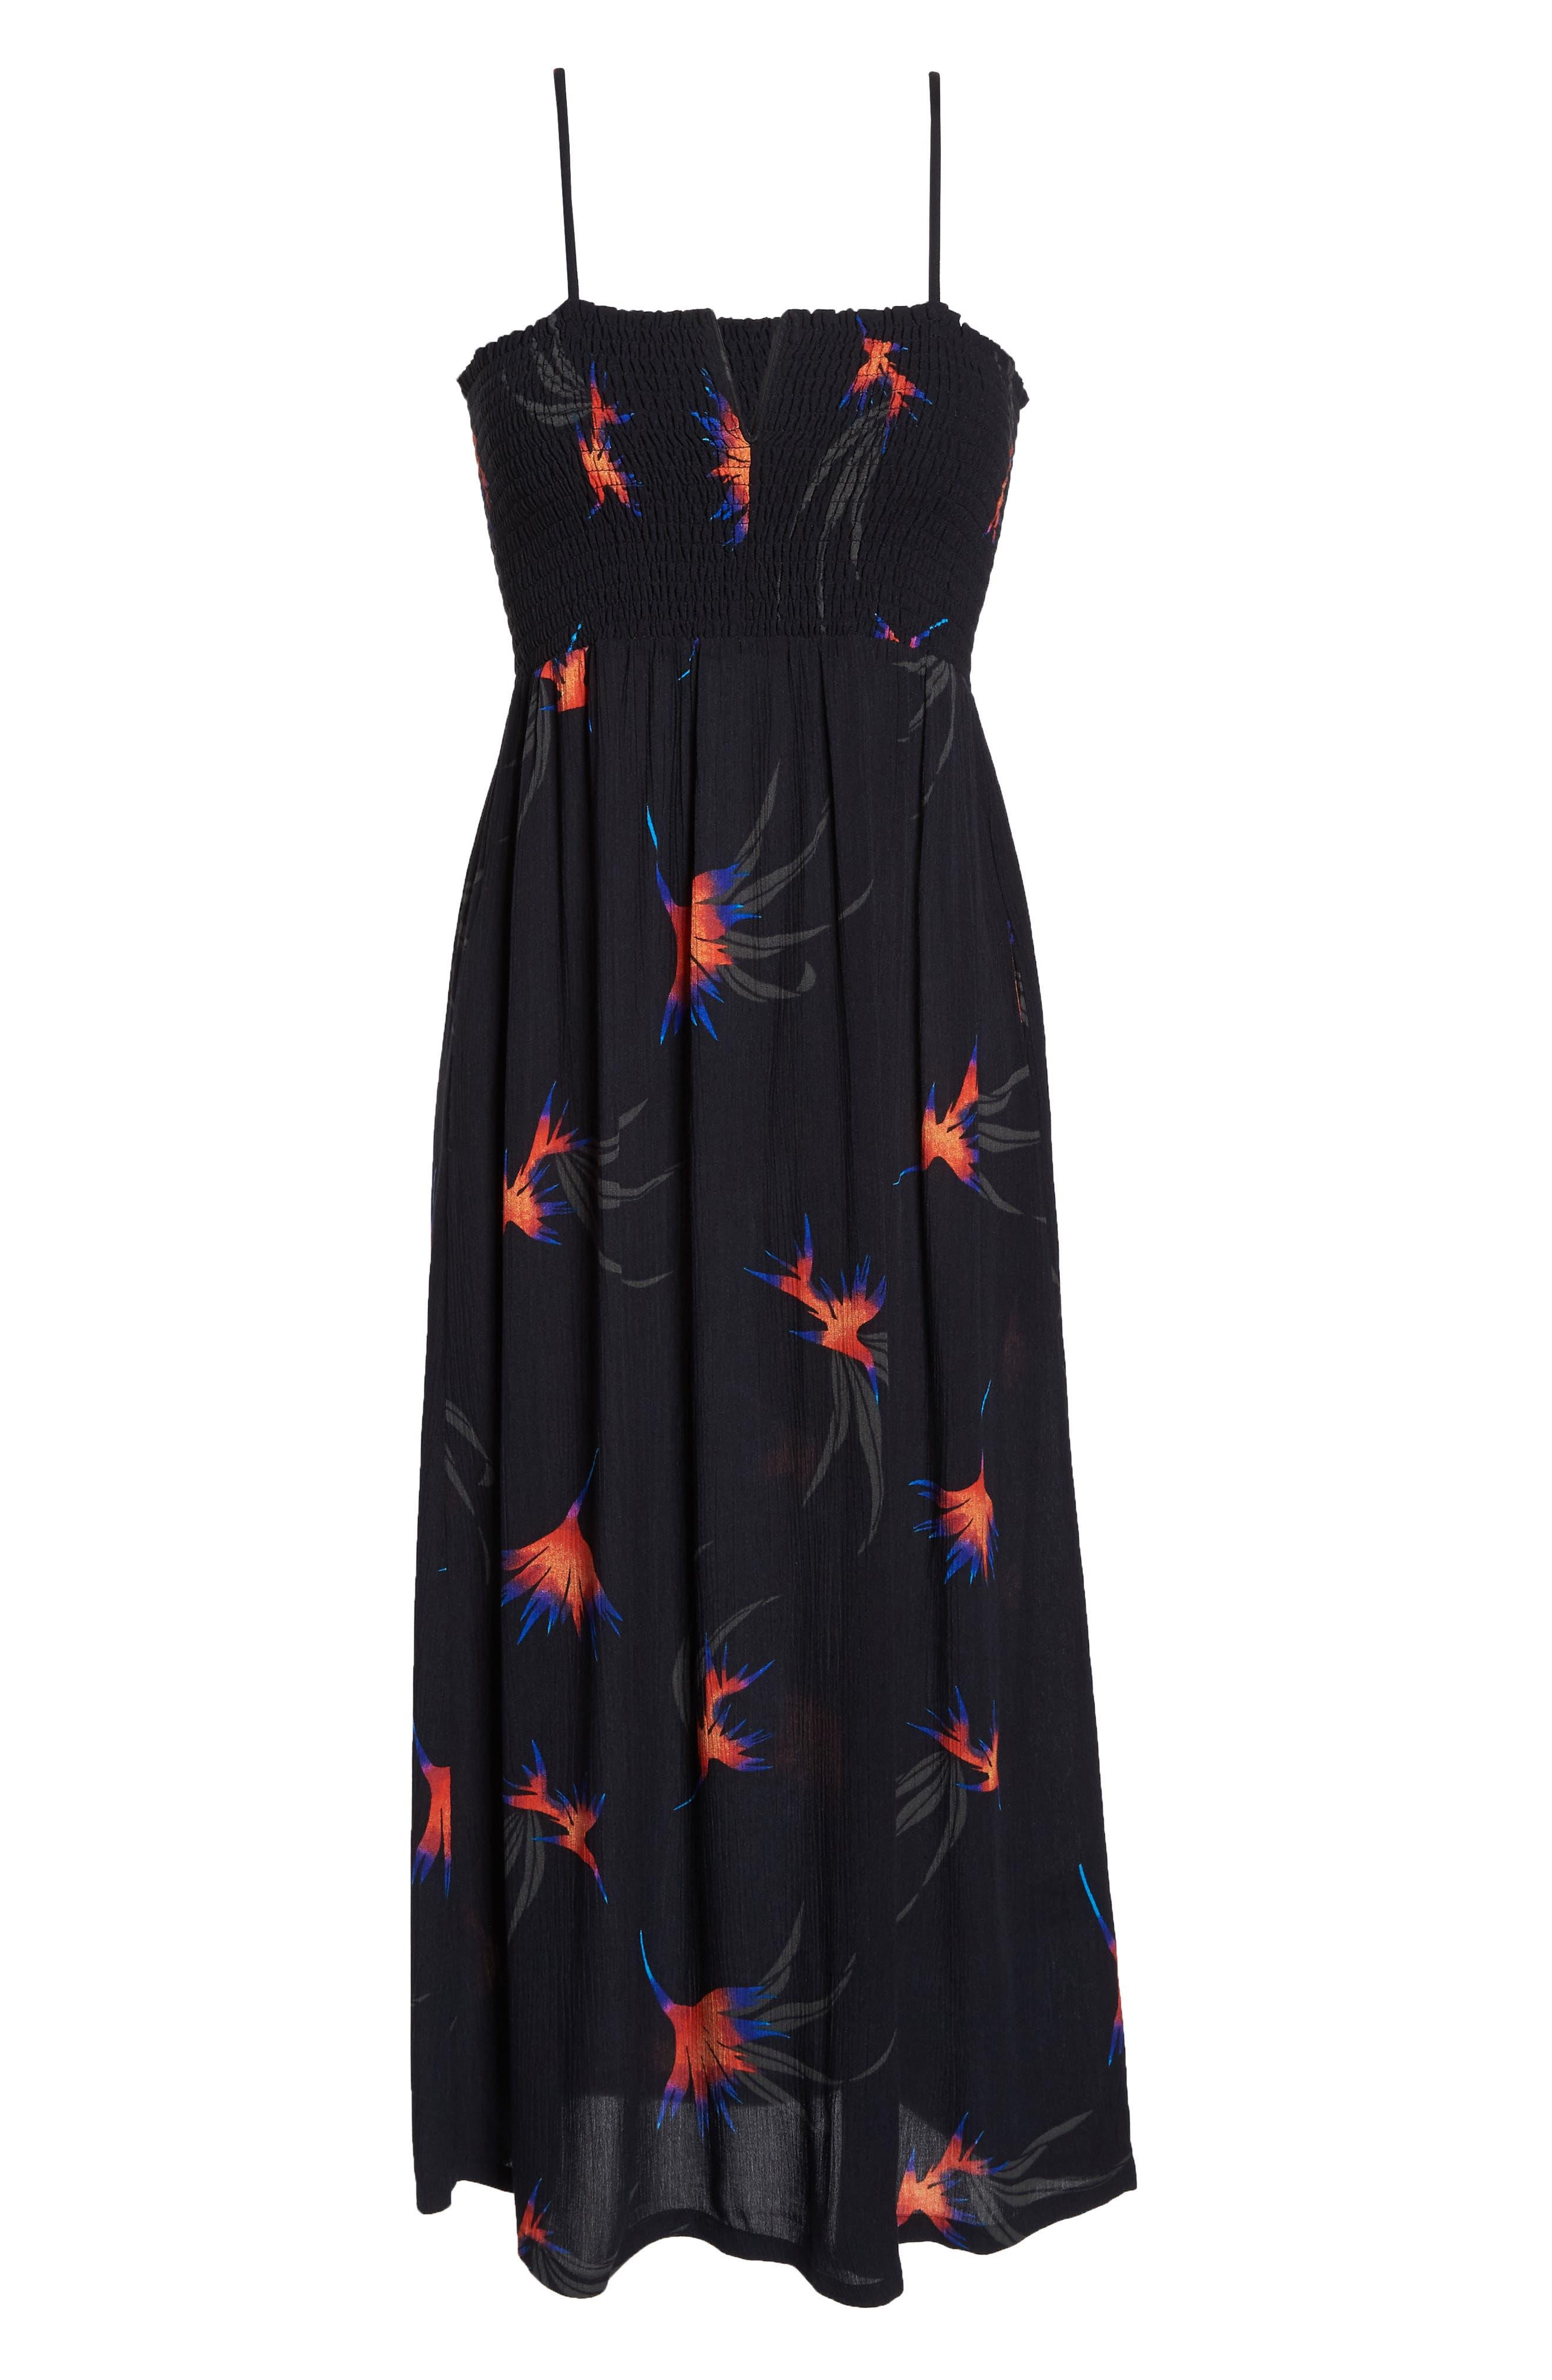 Sydney Midi Dress,                             Alternate thumbnail 7, color,                             Black Paradise City Print